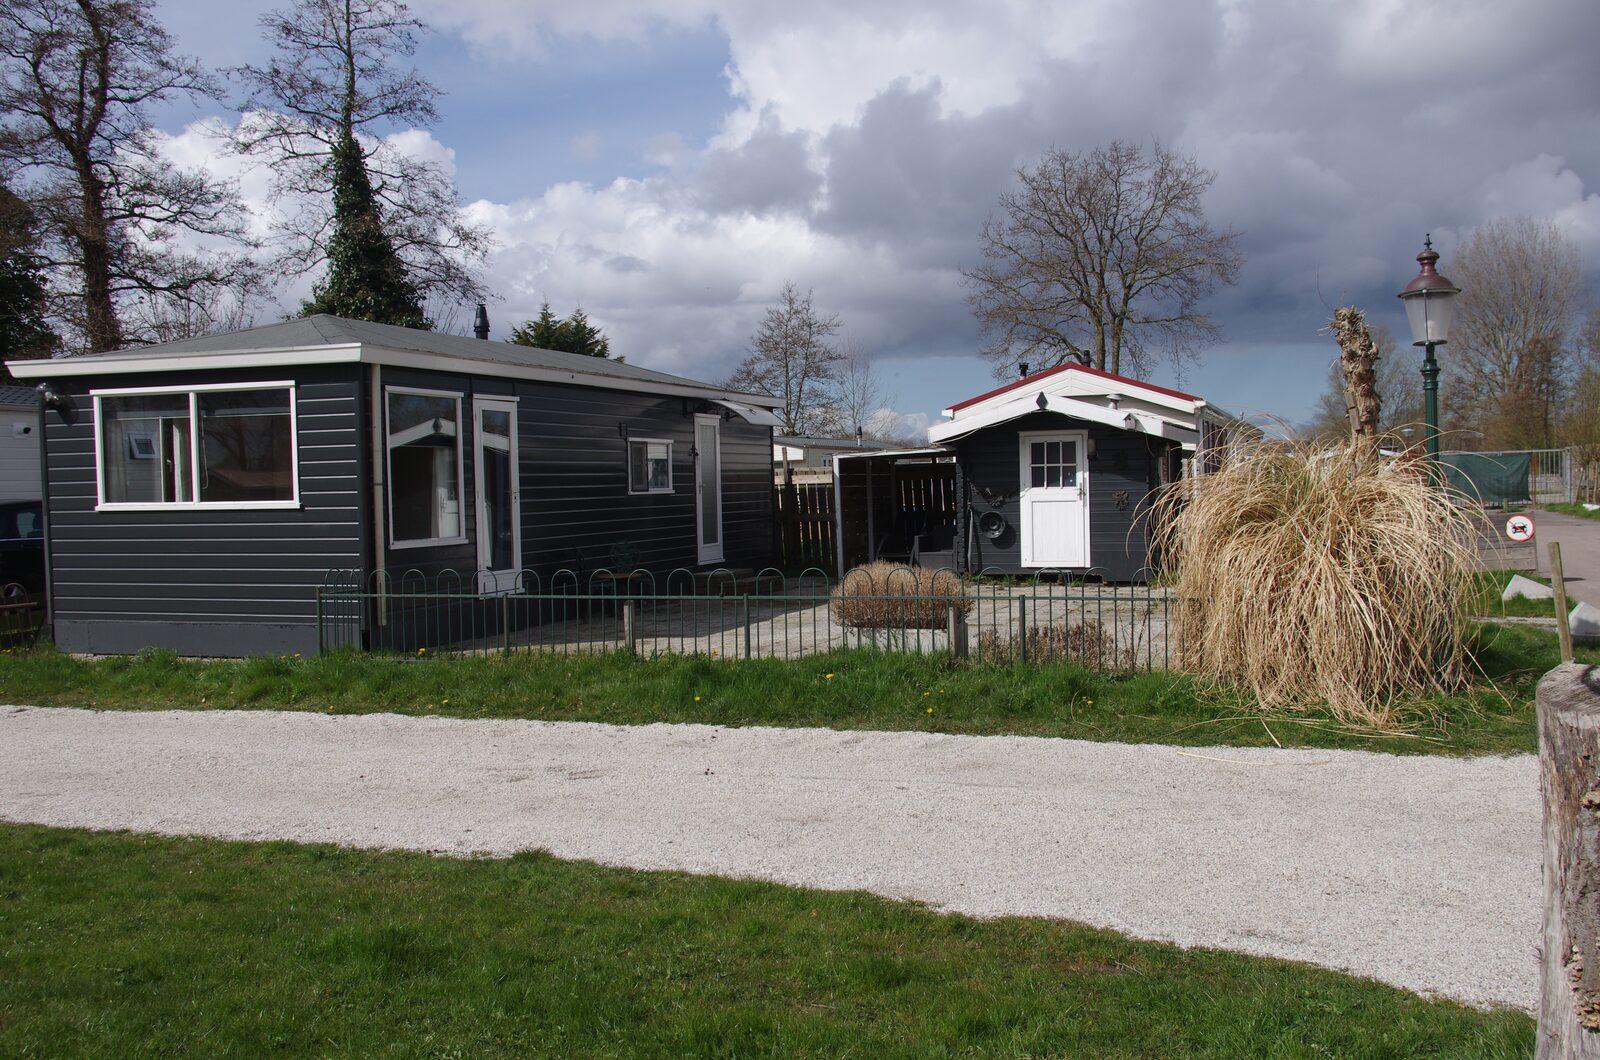 373 Chaletpark Holiday vraagprijs € 52.500 k.k. (inclusief kavel)